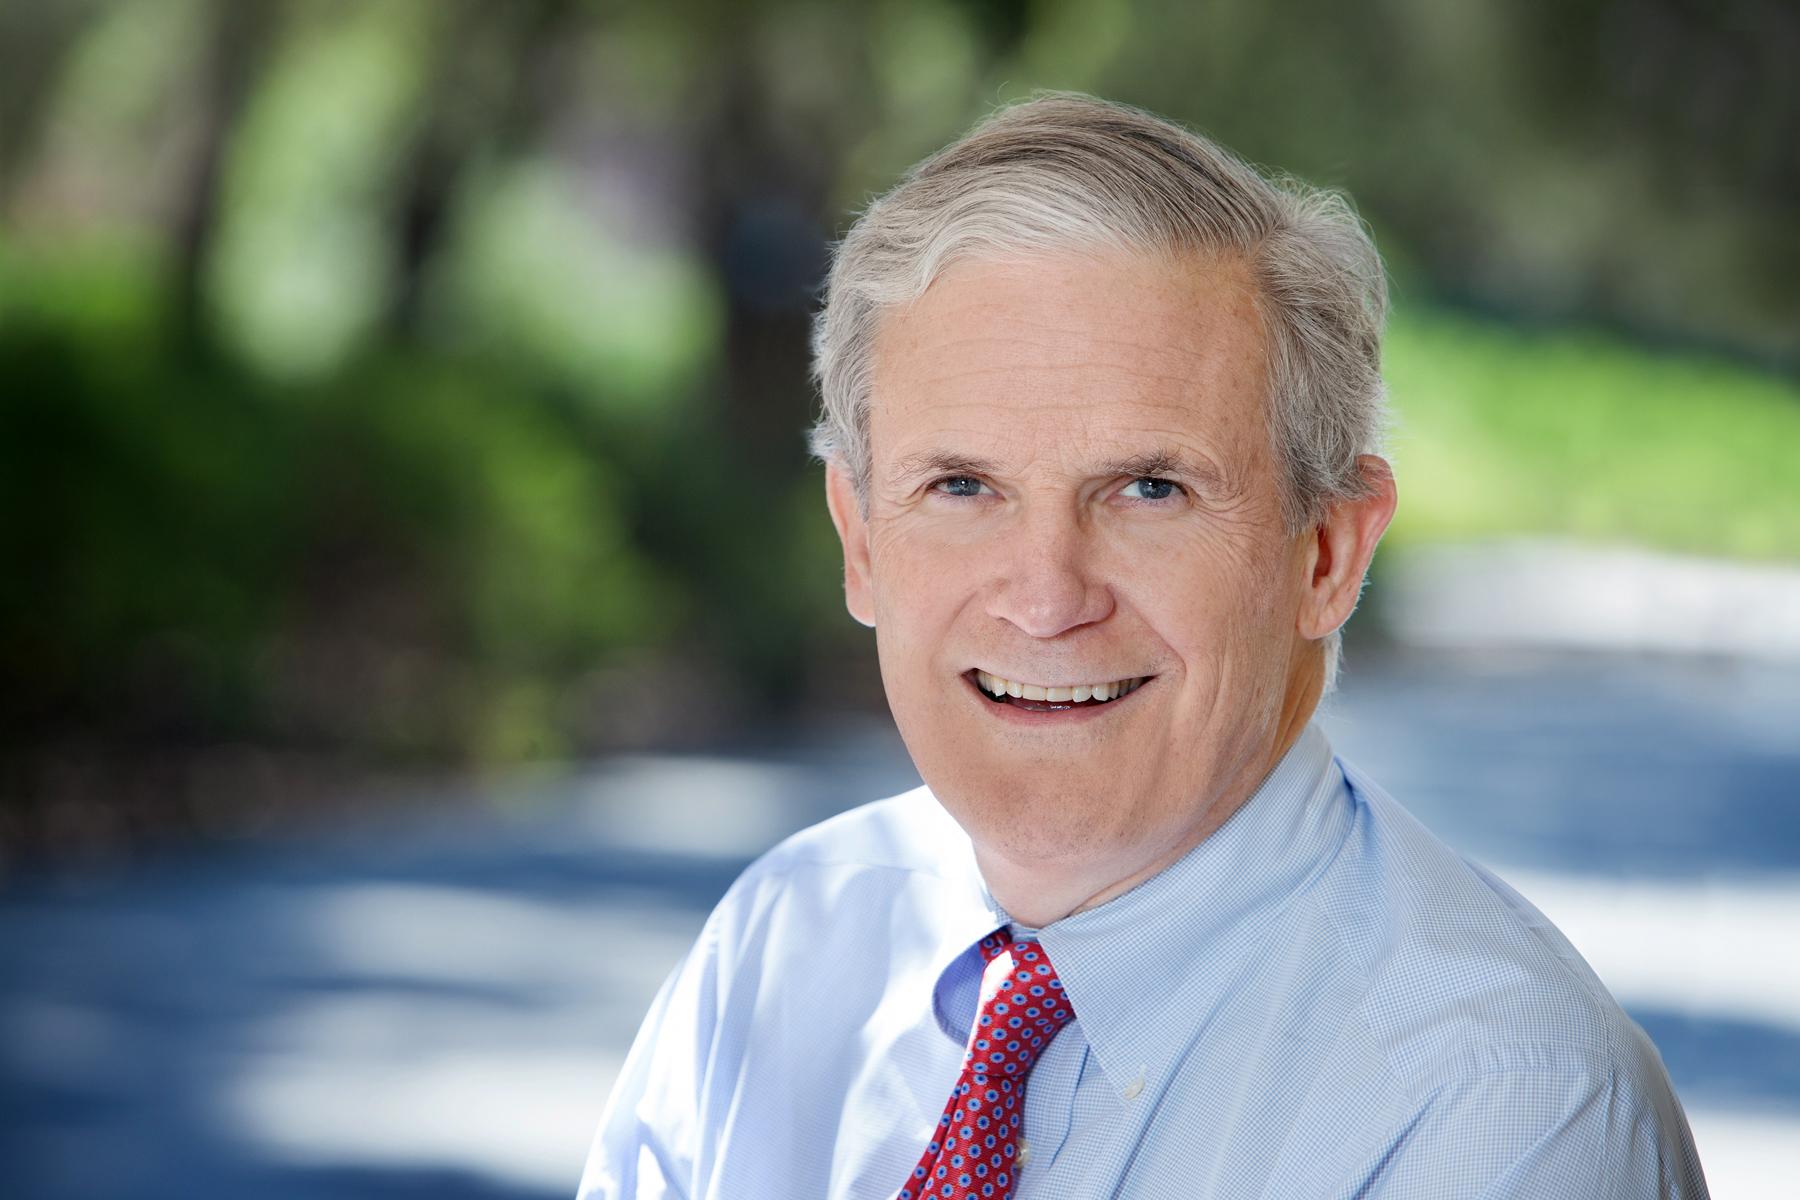 Bill Meehan, Special Advisor